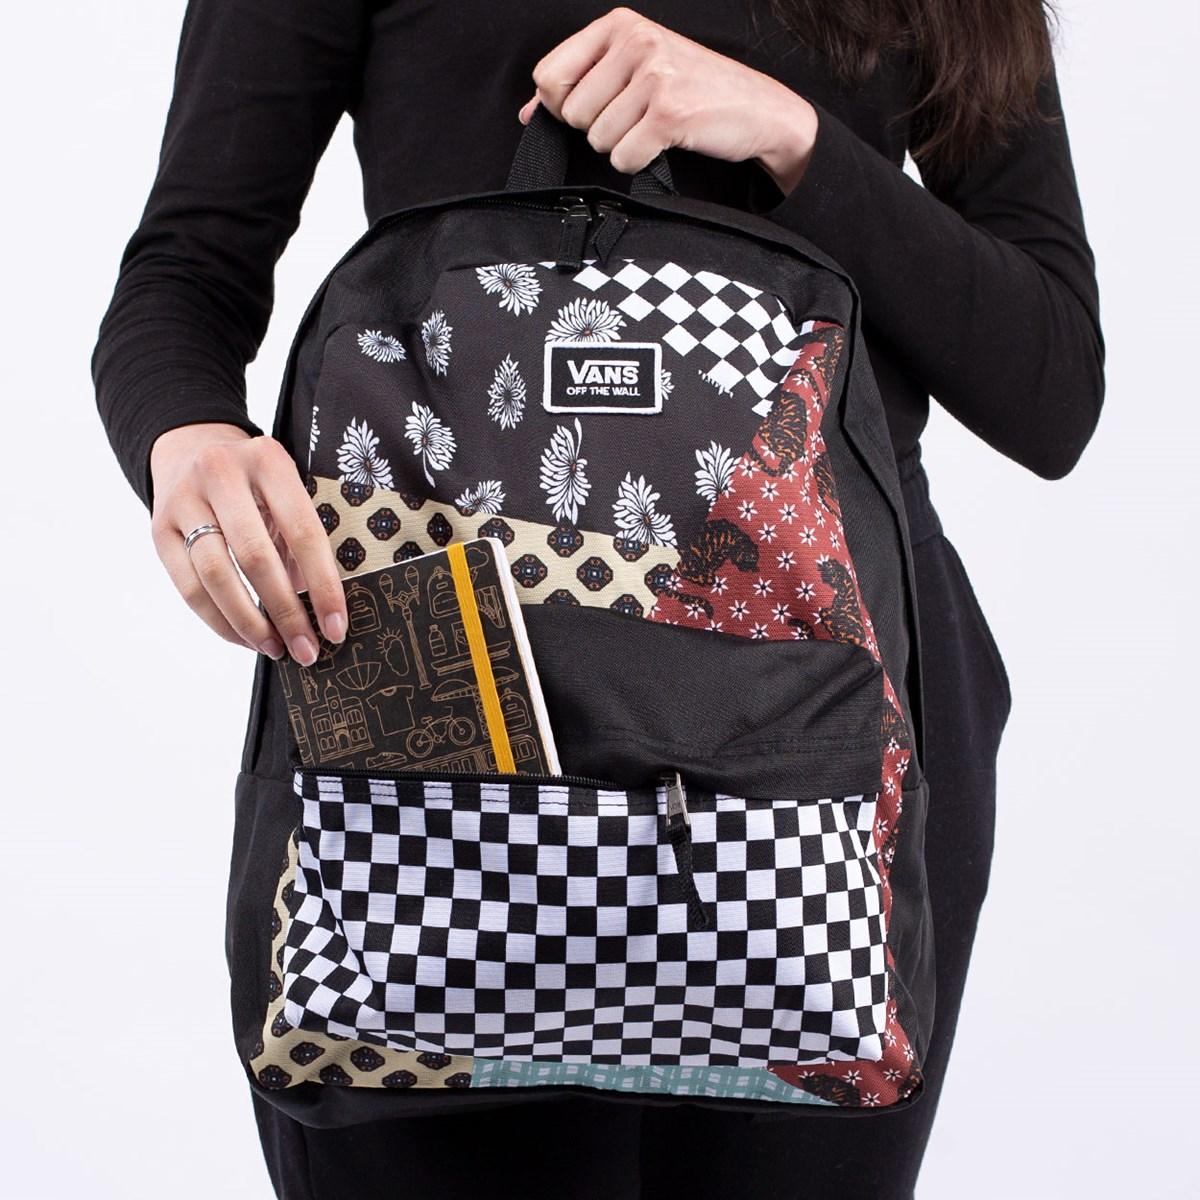 Mochila Vans Realm Classic Backpack Floral Patchwork VN0A3UI7ZL7